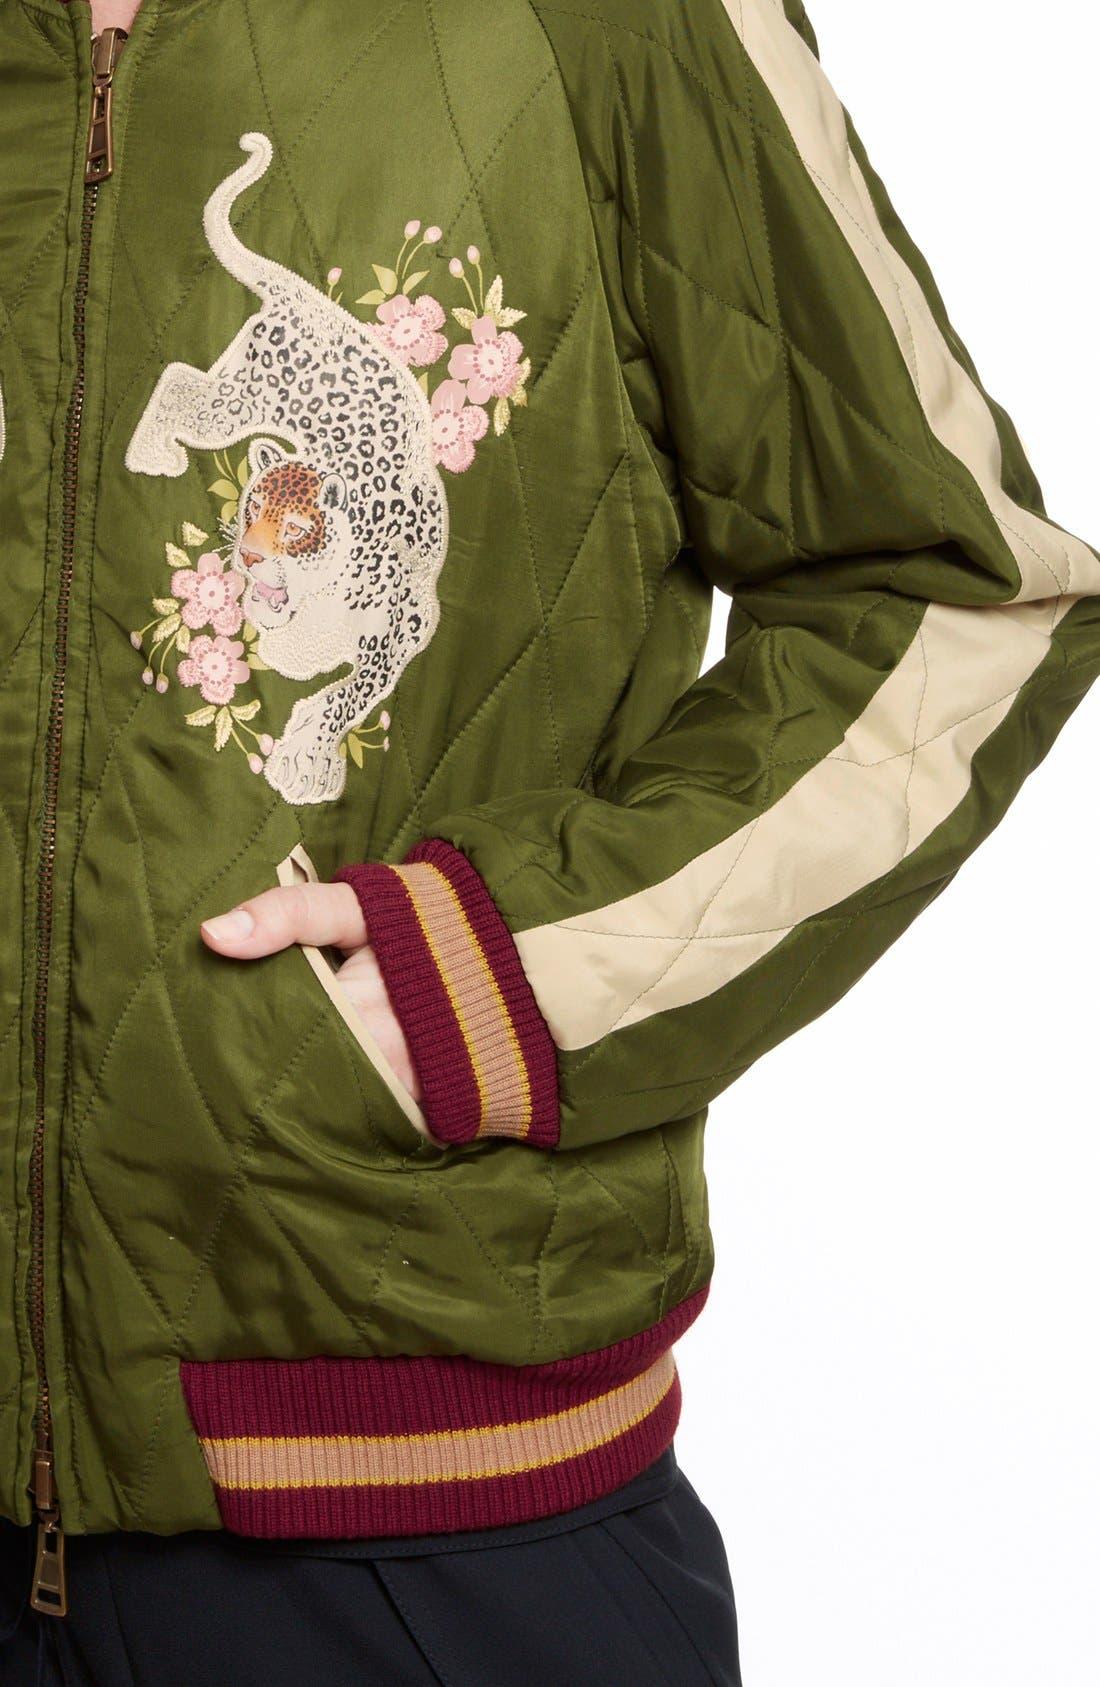 CHLOÉ, Reversible Embroidered Tech Satin Bomber Jacket, Alternate thumbnail 2, color, 301